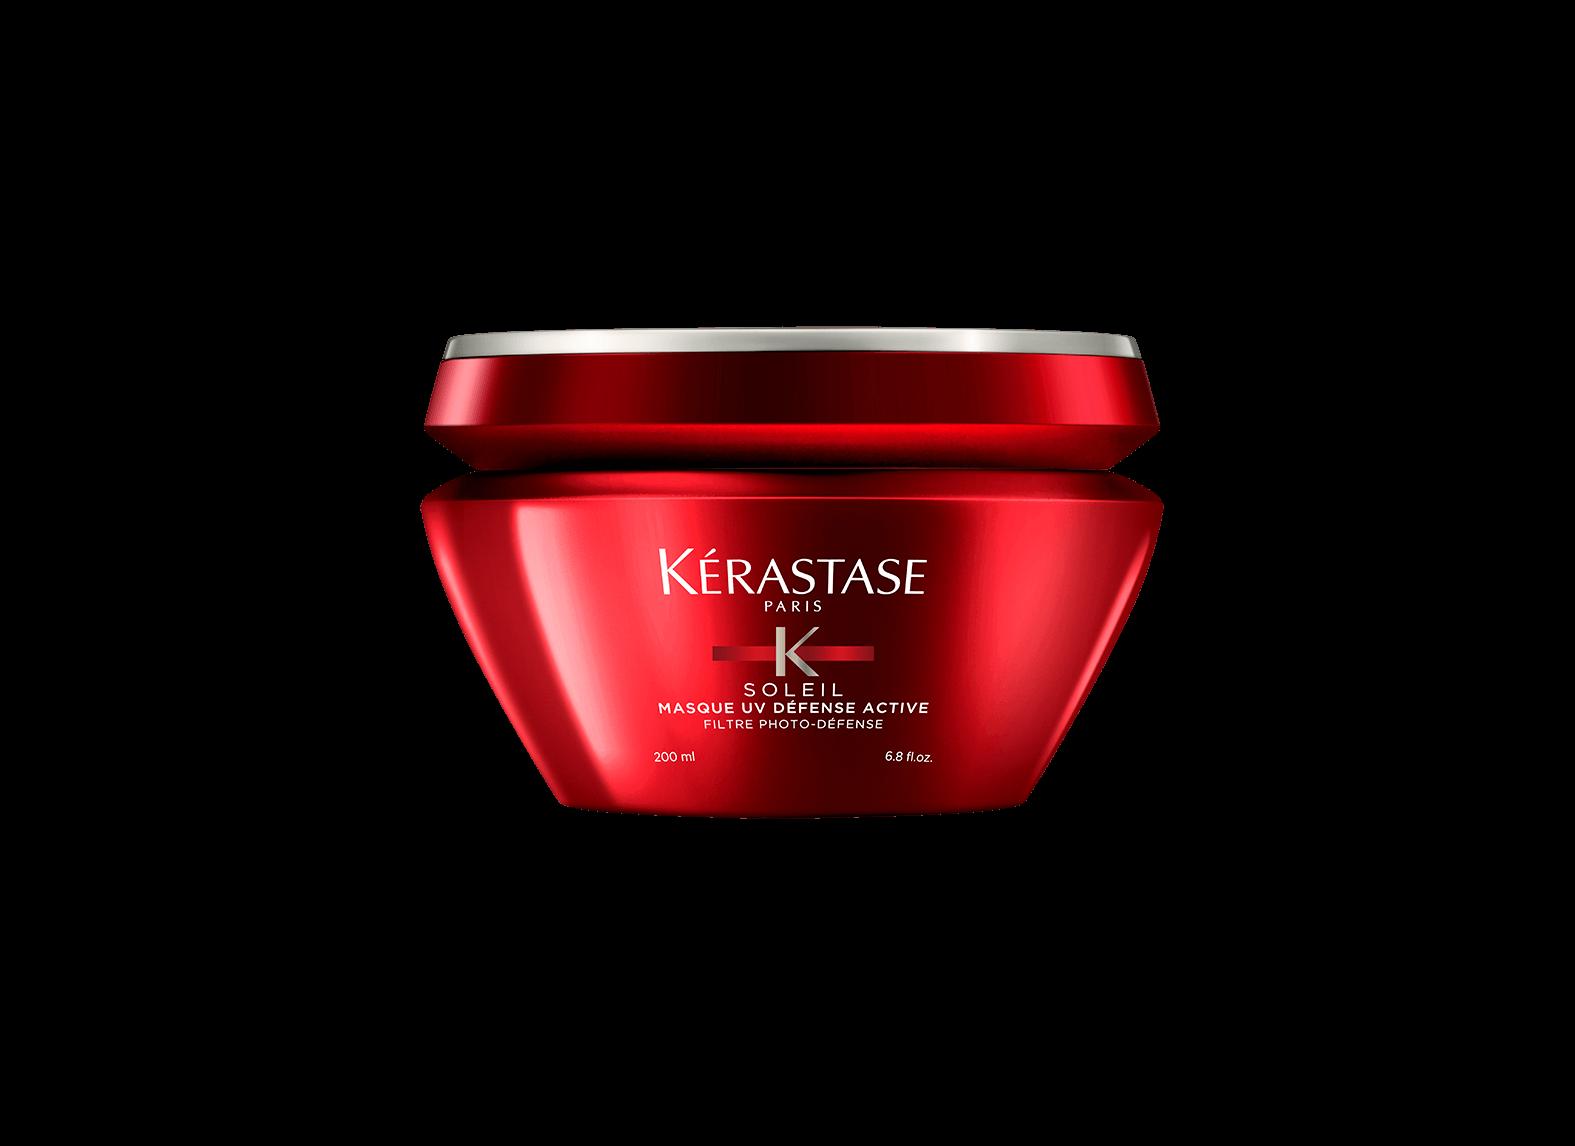 Kérastase Masque UV Defense Active 200ml k rastase   soleil   περιποίηση   προστασία από τον ήλιο   για όλους τους τύπους